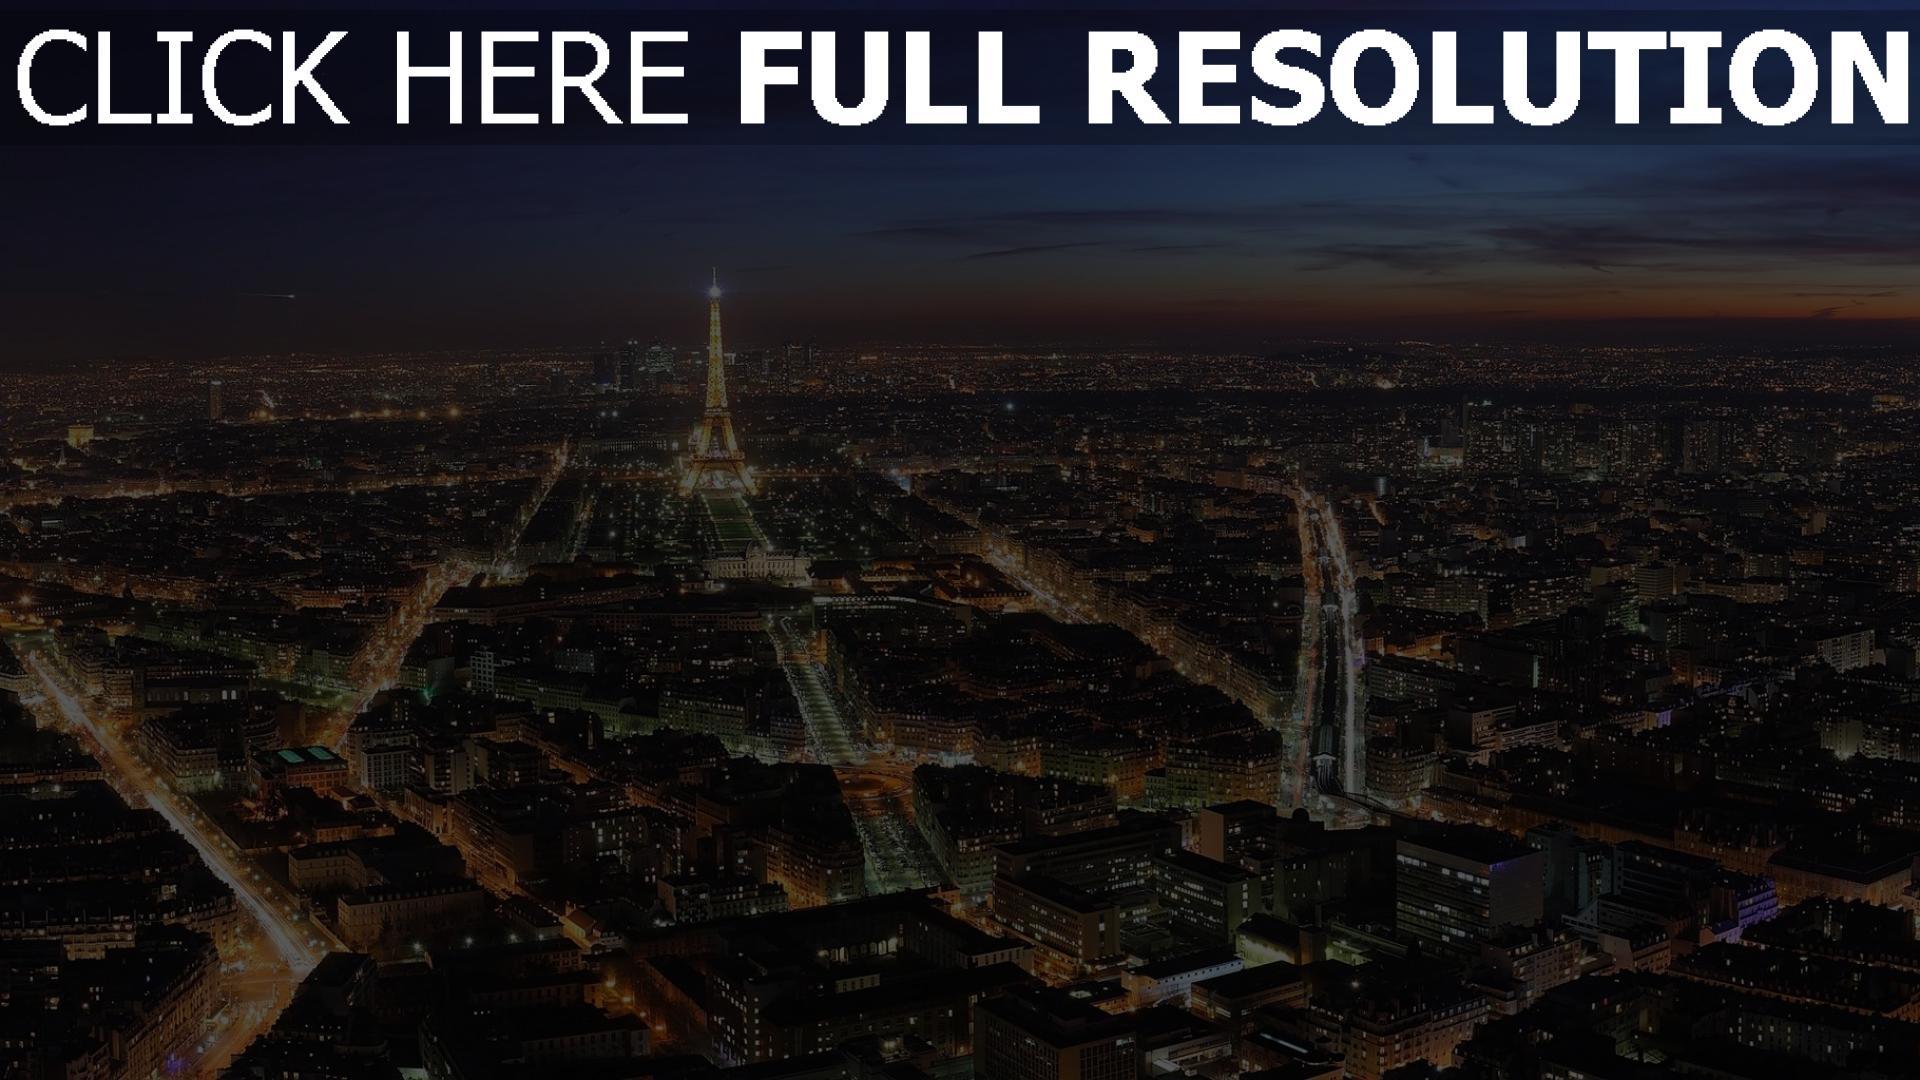 Paris by night 115 full hd 1080p